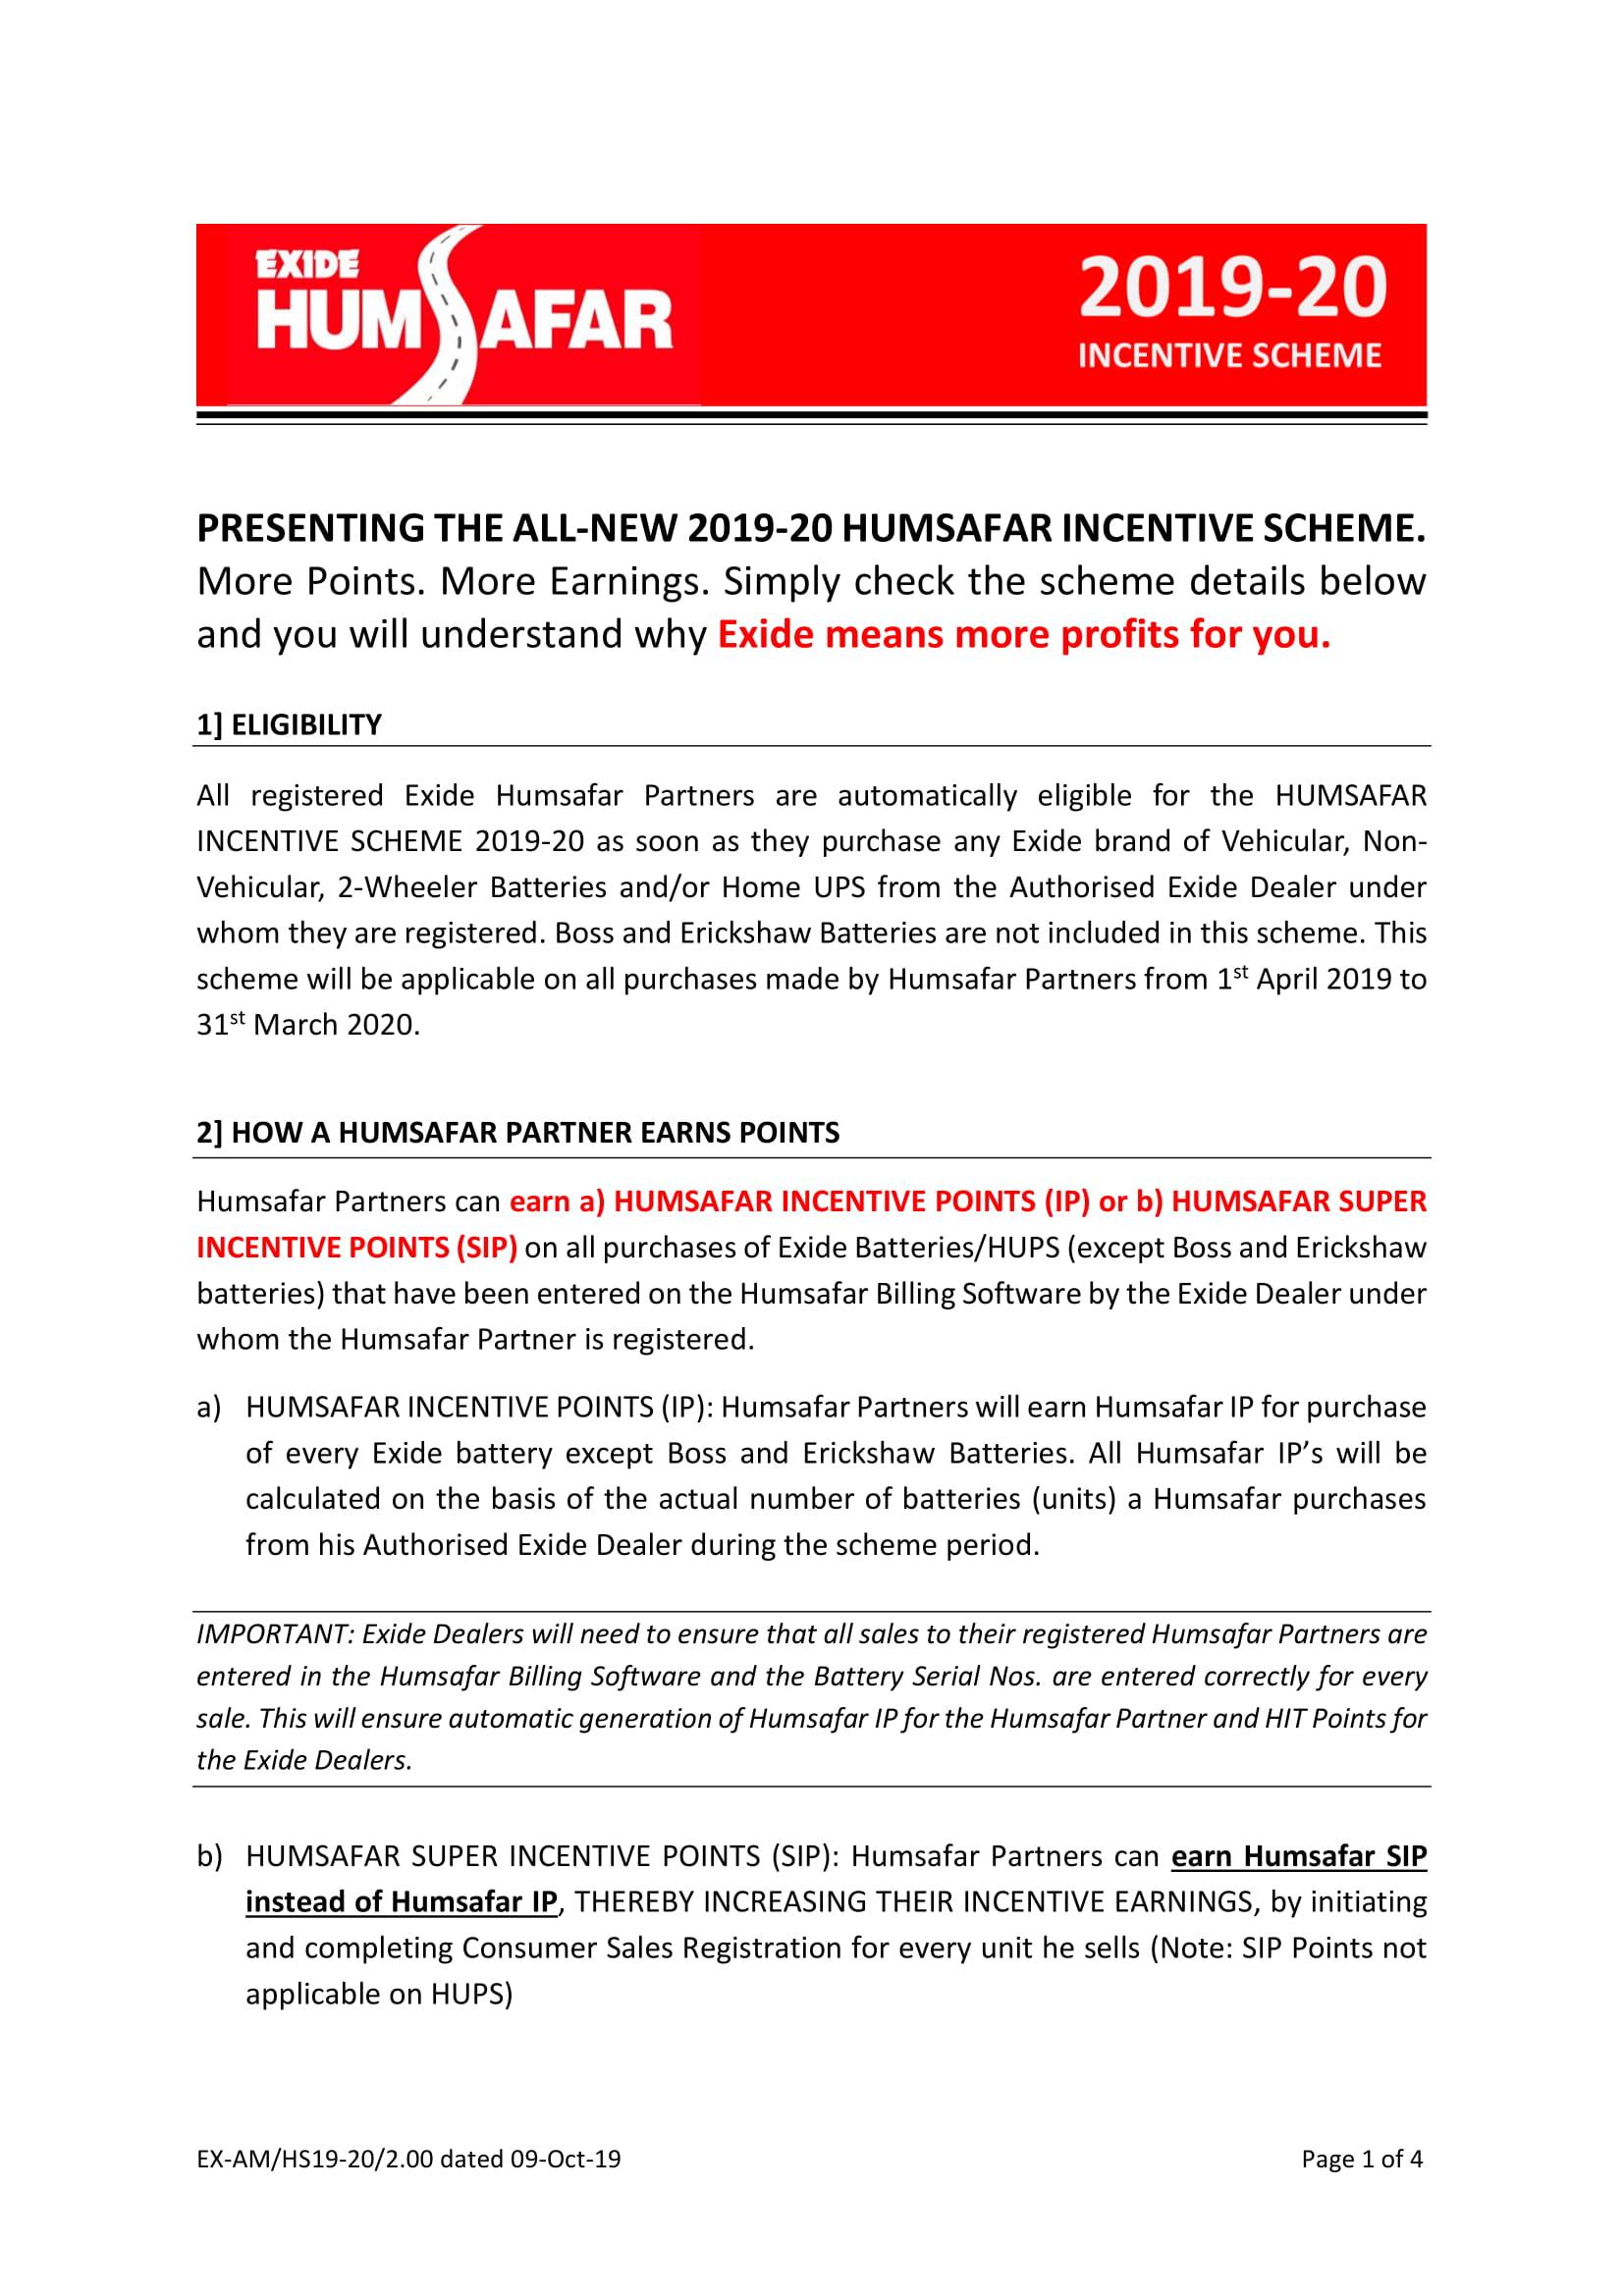 Exide Humsafar Dealer Scheme 19-20